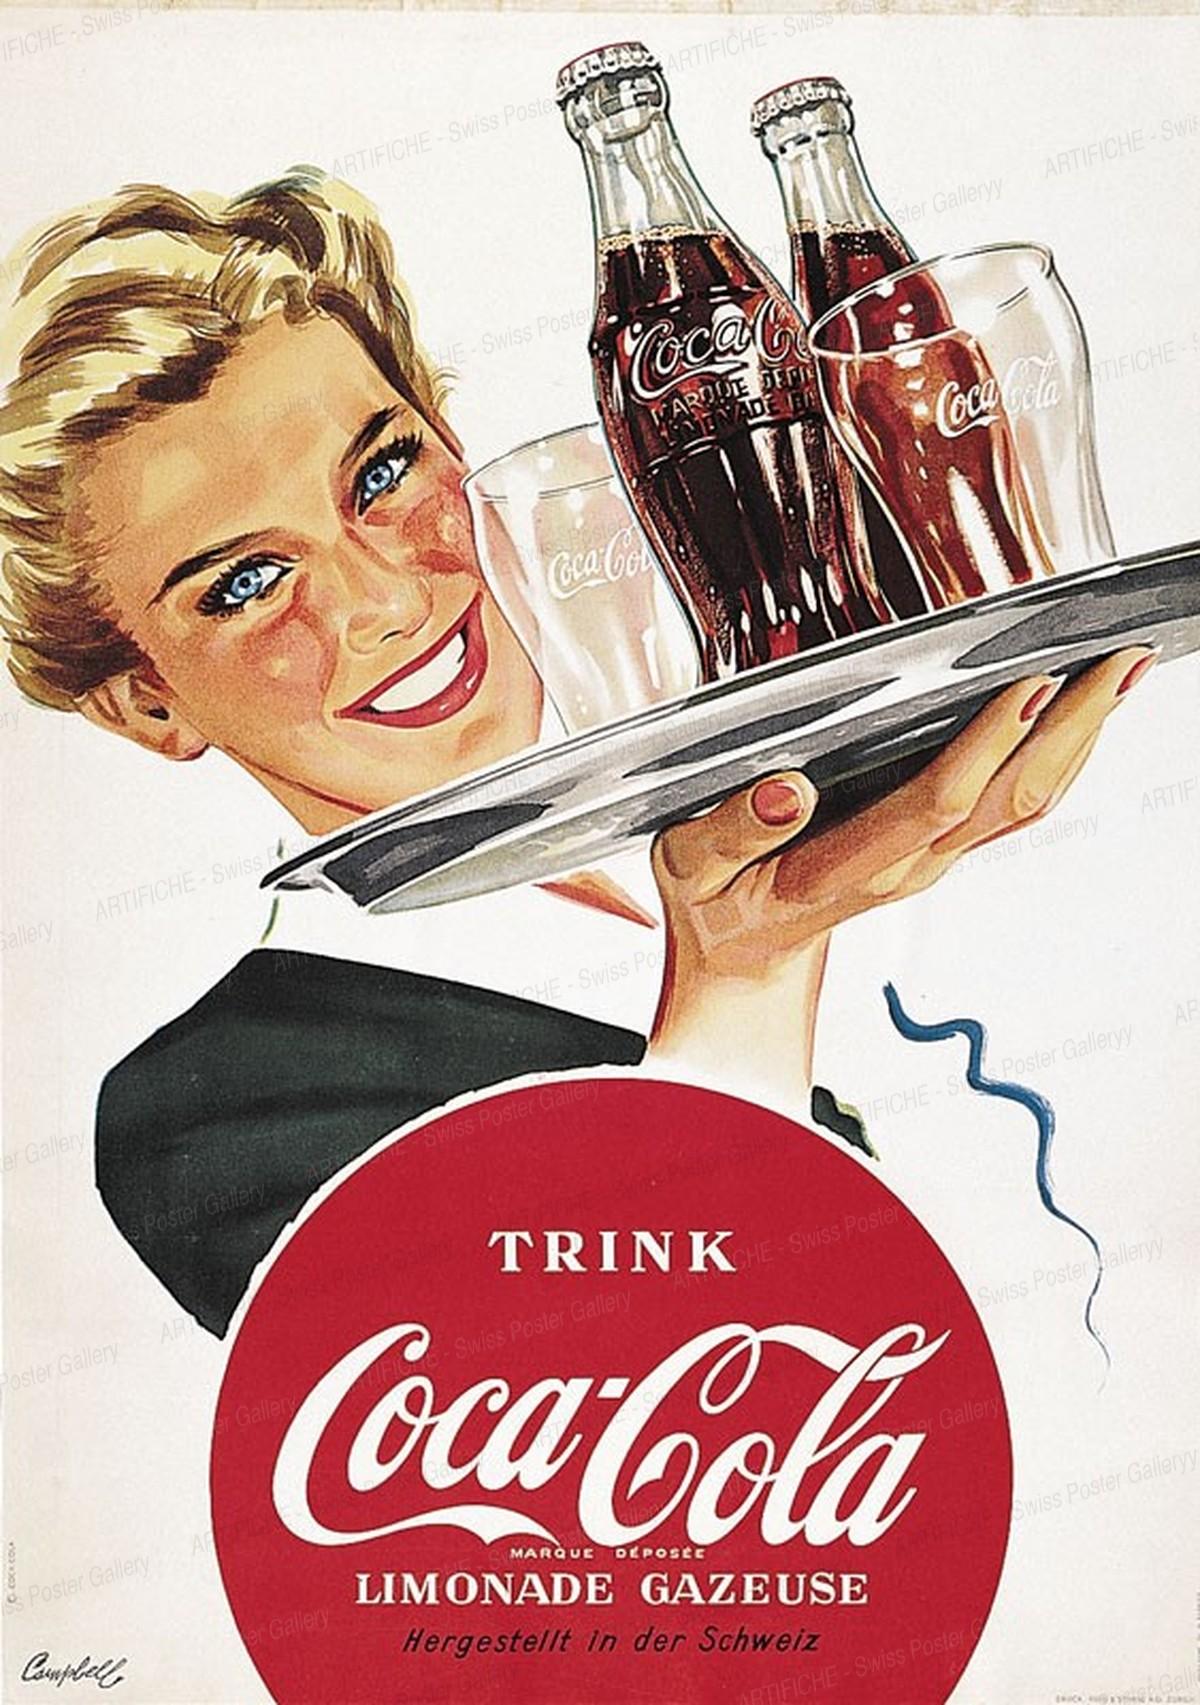 drink Coca-Cola, Marcus Campbell